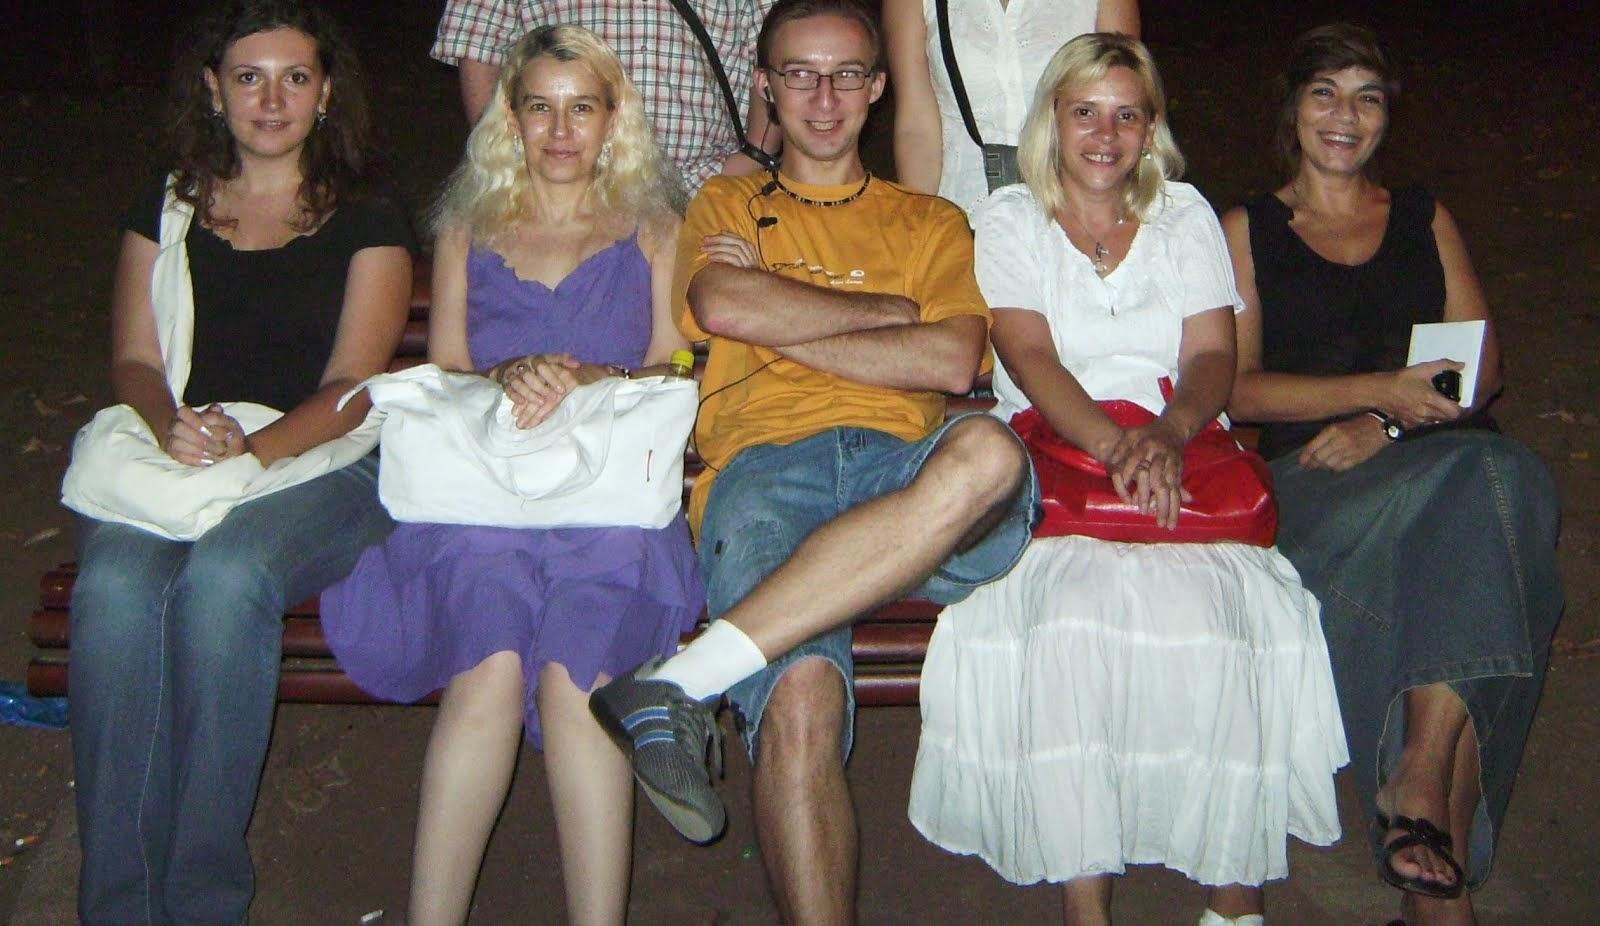 Olivia Maria Marcov, Alexandra Georgescu, Adrian Pafa, Bianca Eftimie, aug.2009, Bucharest